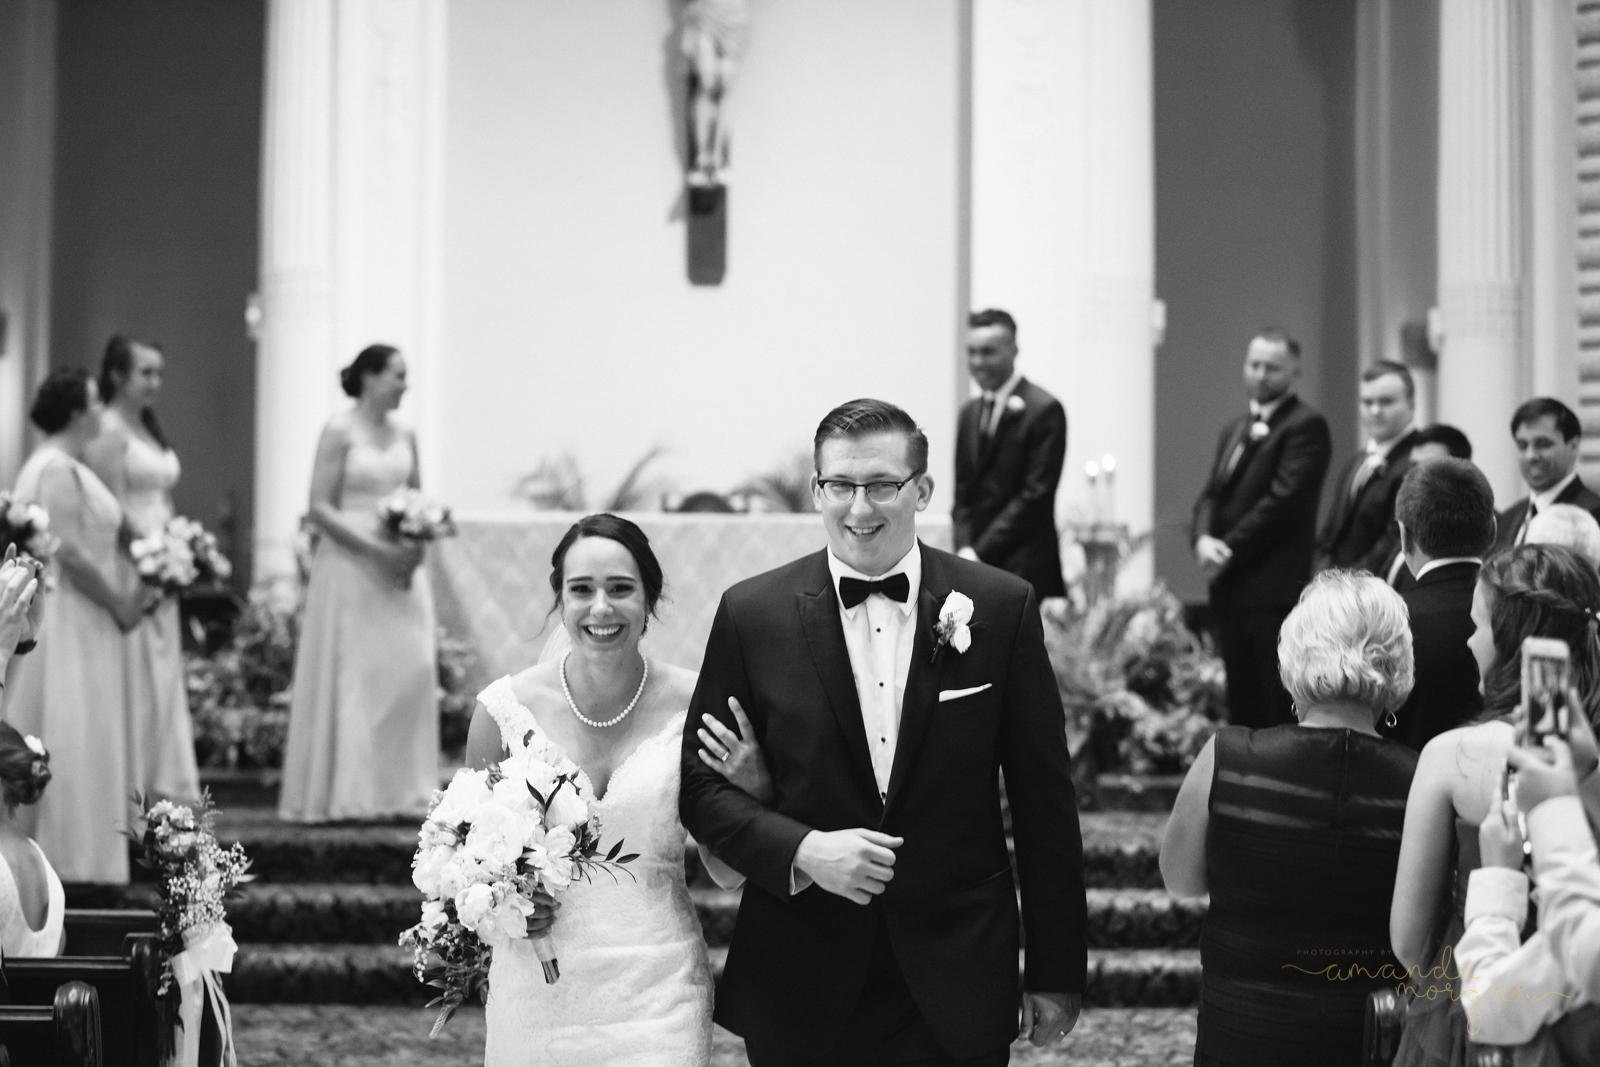 Notre-Dame-Catholic-Church-Wedding-Amanda-Morgan-8.jpg